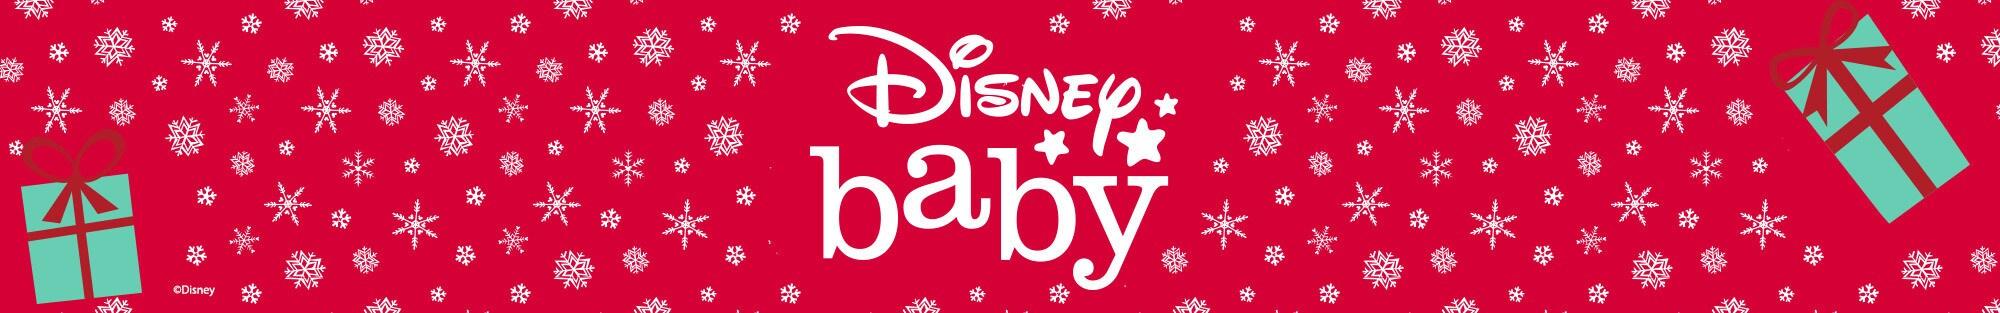 Mid_ShopDisney_Disney Baby_Jul20_(Ext)